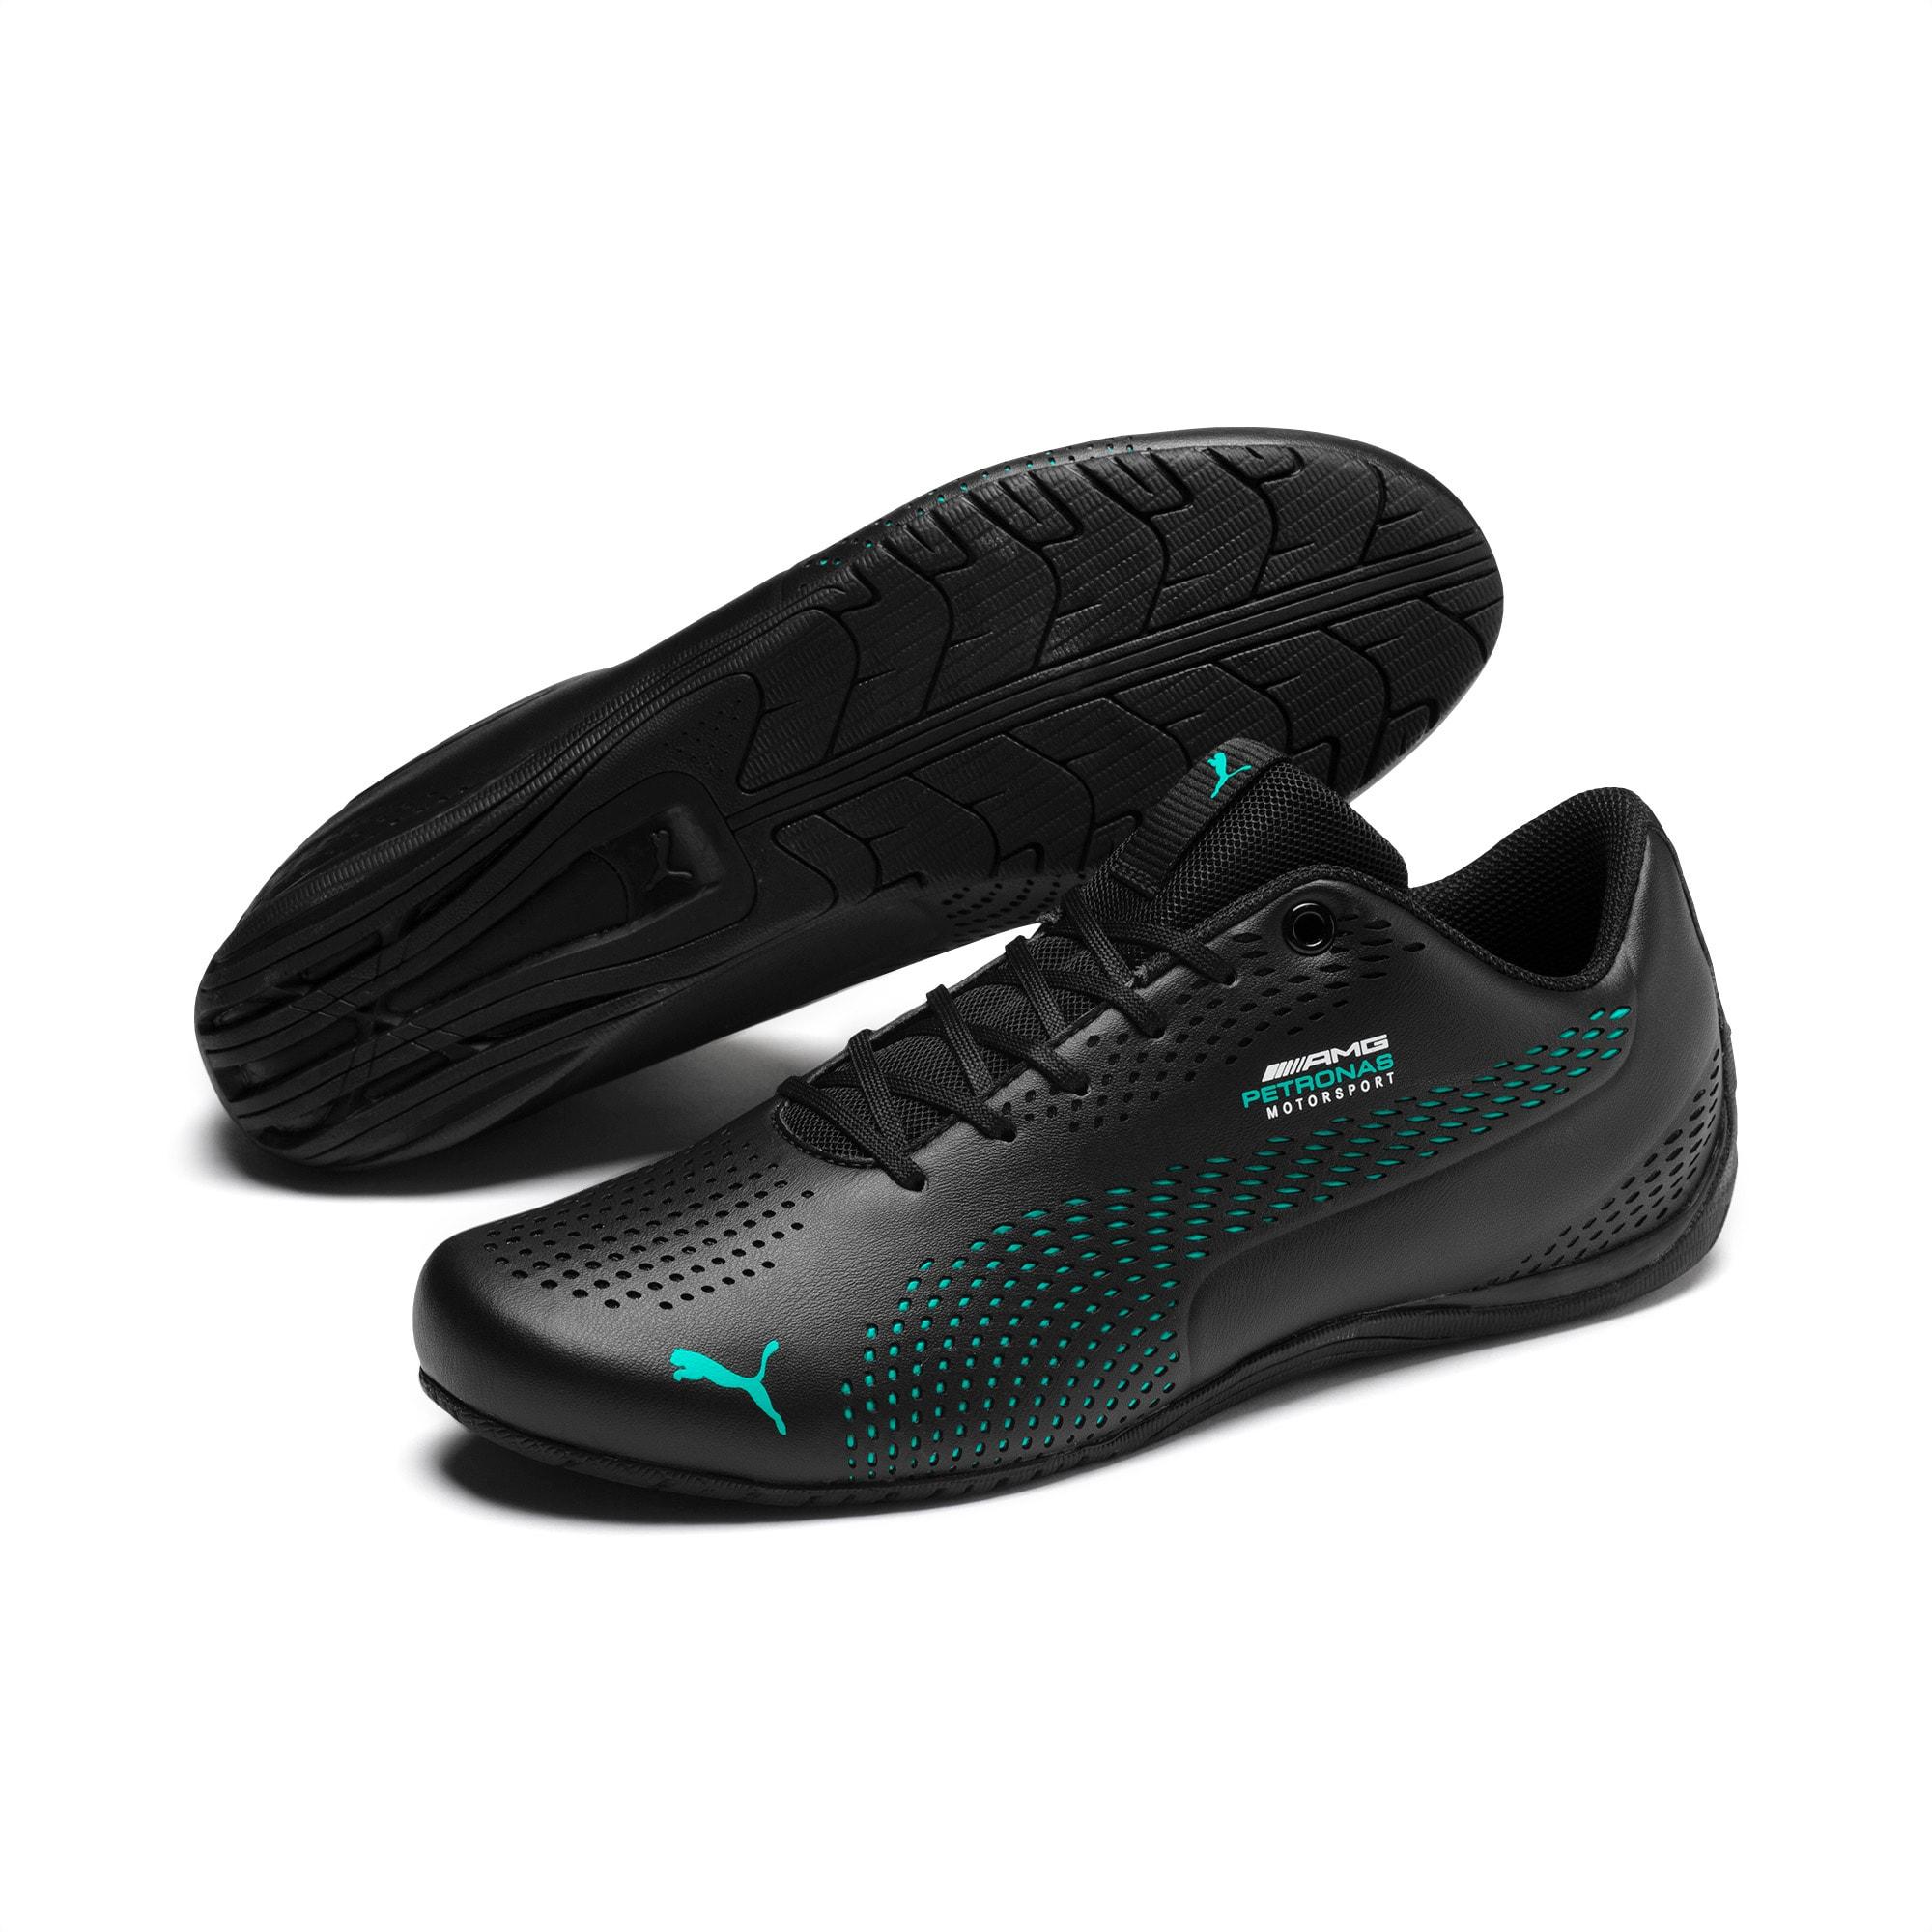 Mercedes-AMG Petronas Drift Cat 5 Ultra II Men's Shoes